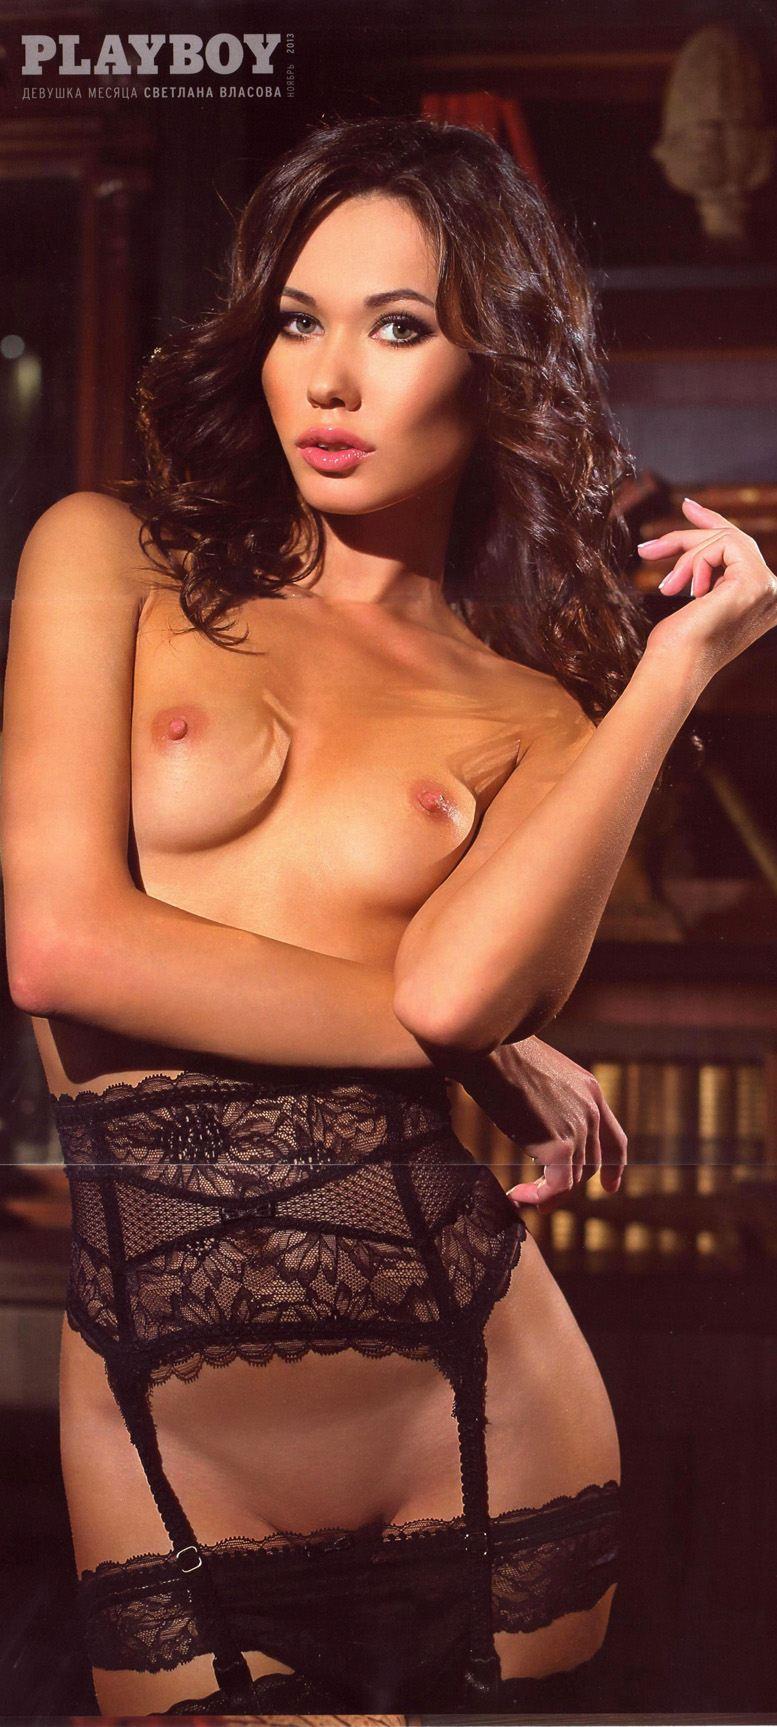 ������� ������ �������� ������� - Playboy ������� ������ 2013